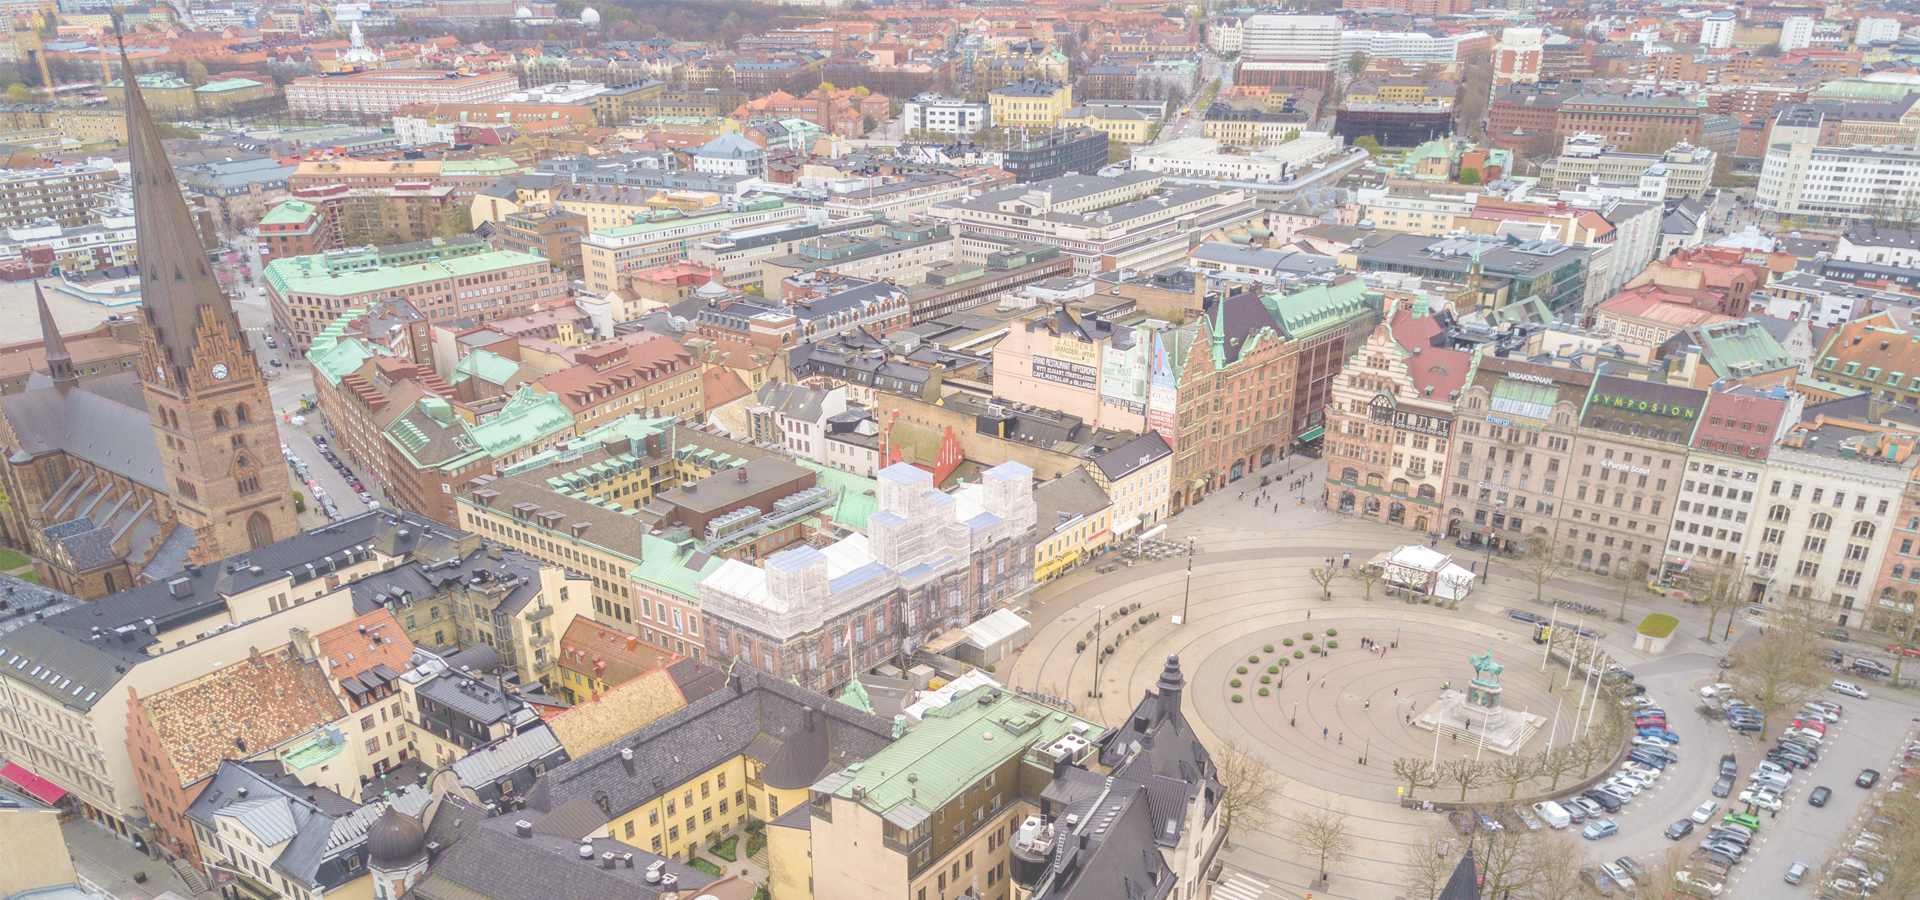 Peer-to-peer advisory in Malmö, Skåne County, Sweden